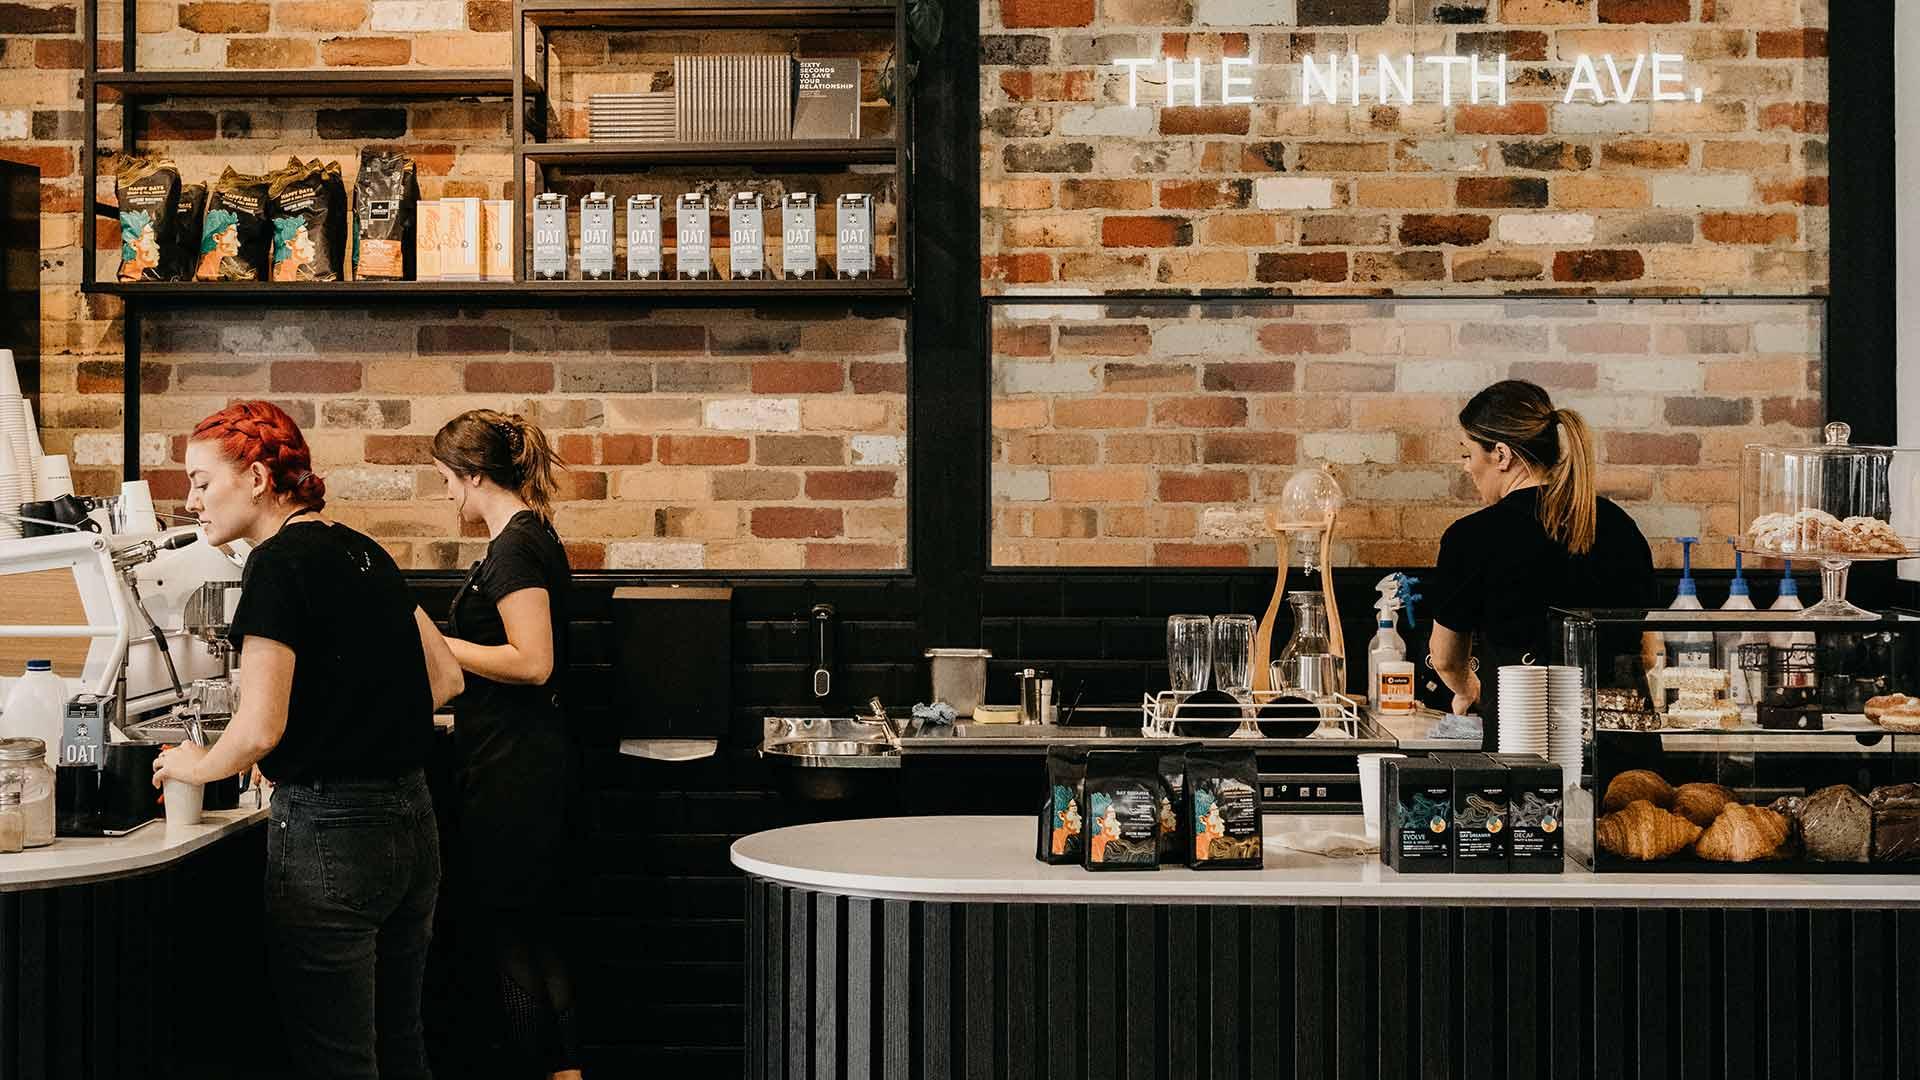 the ninth ave cafe, cafe westmeadows